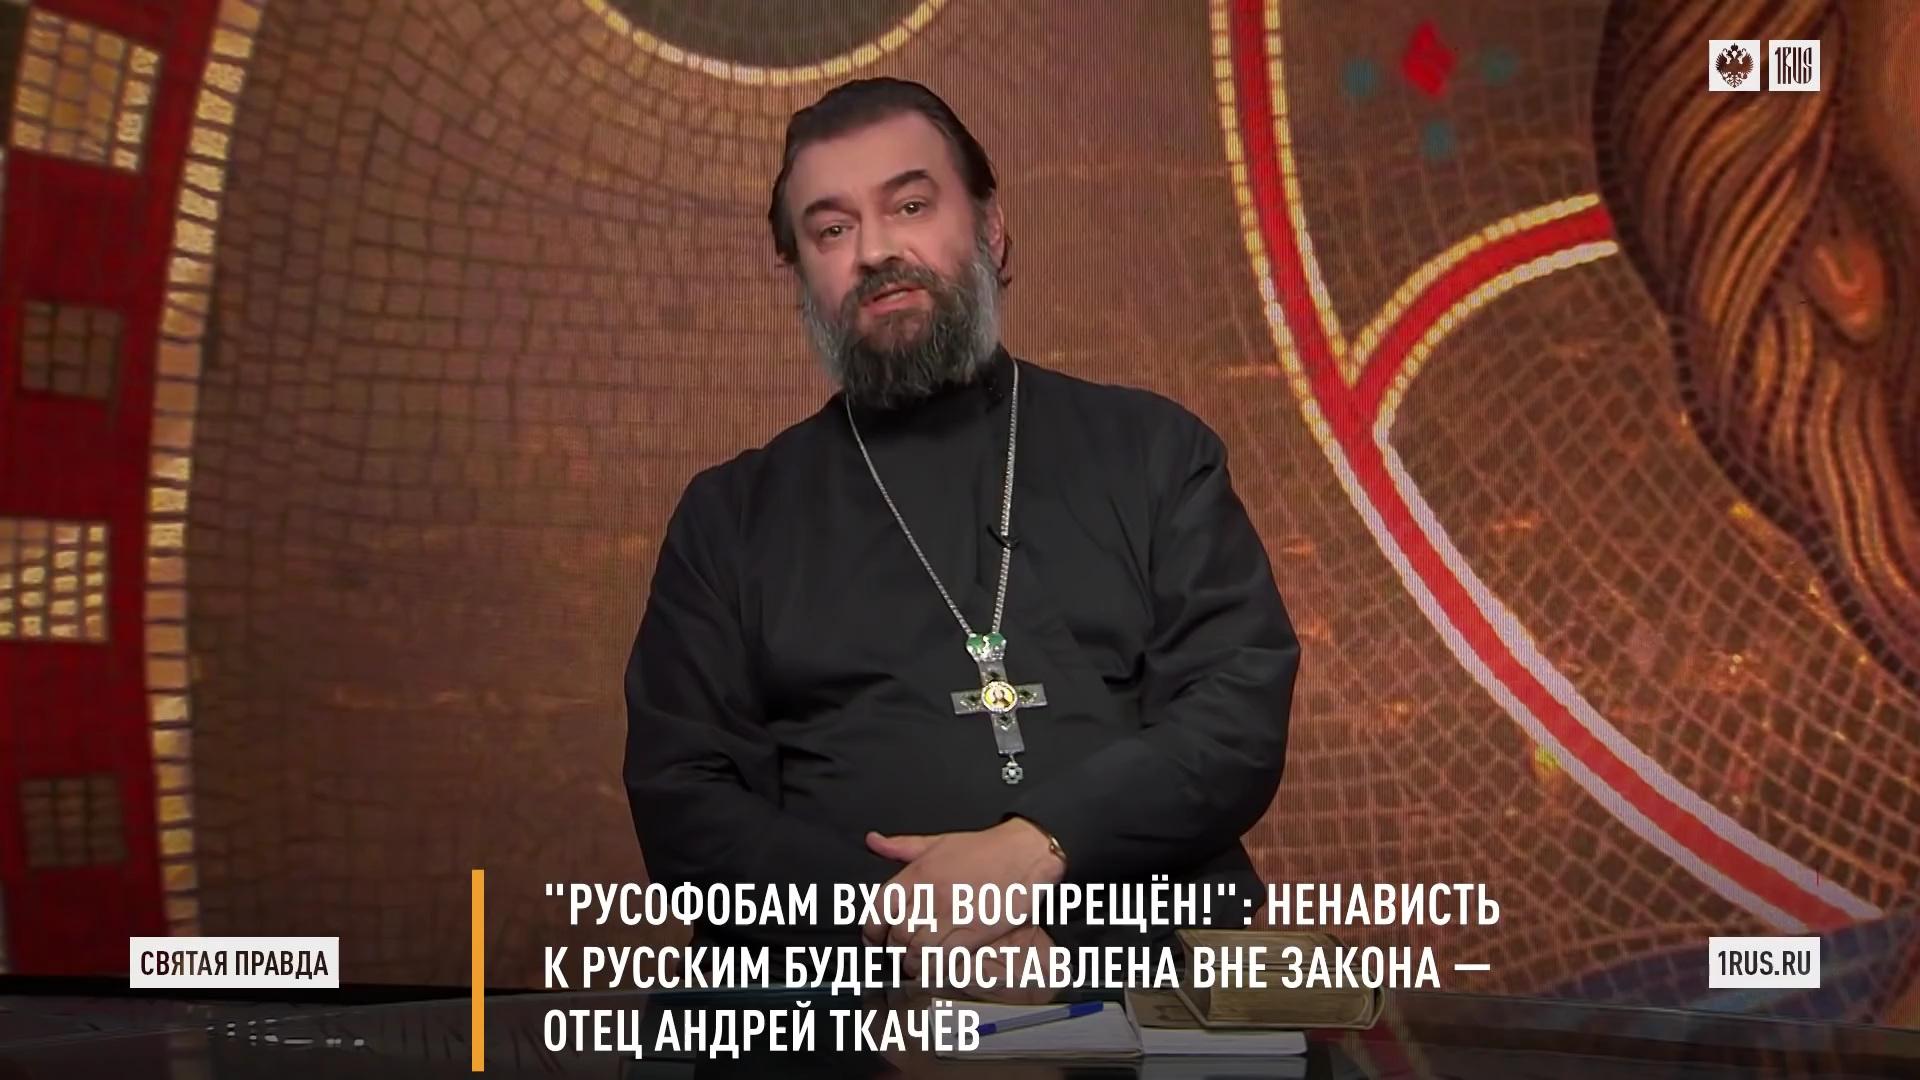 Русофобам вход воспрещён (монолог Андрея Ткачёва).mp4